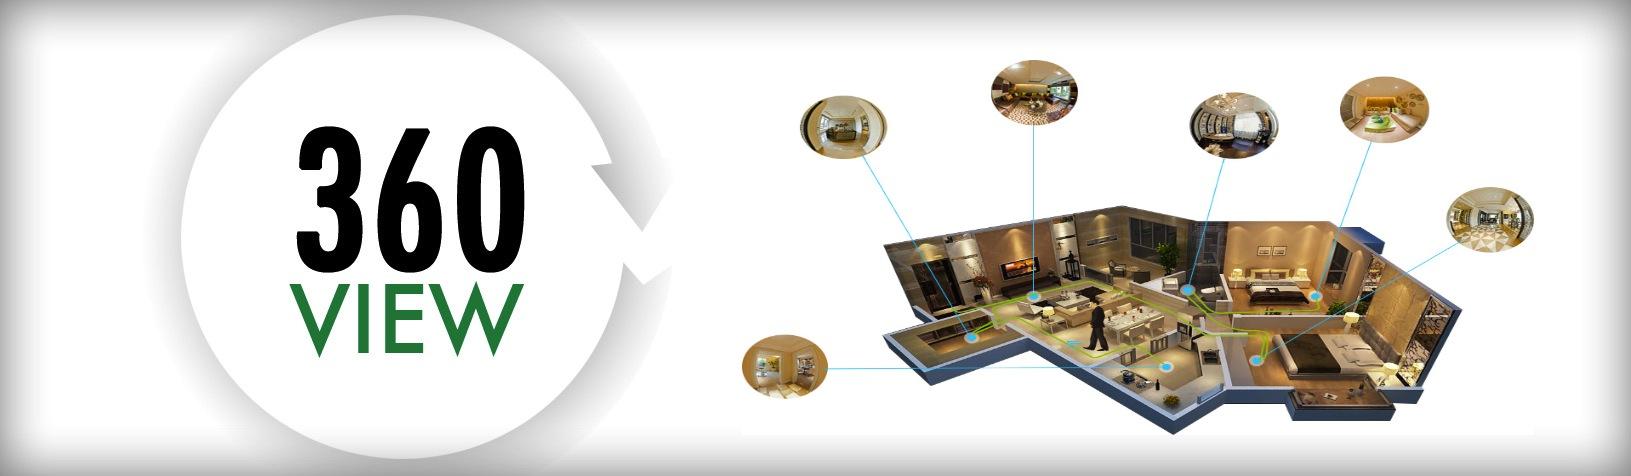 Araya propiedades corretaje administraci n gesti n for Gestion inmobiliaria